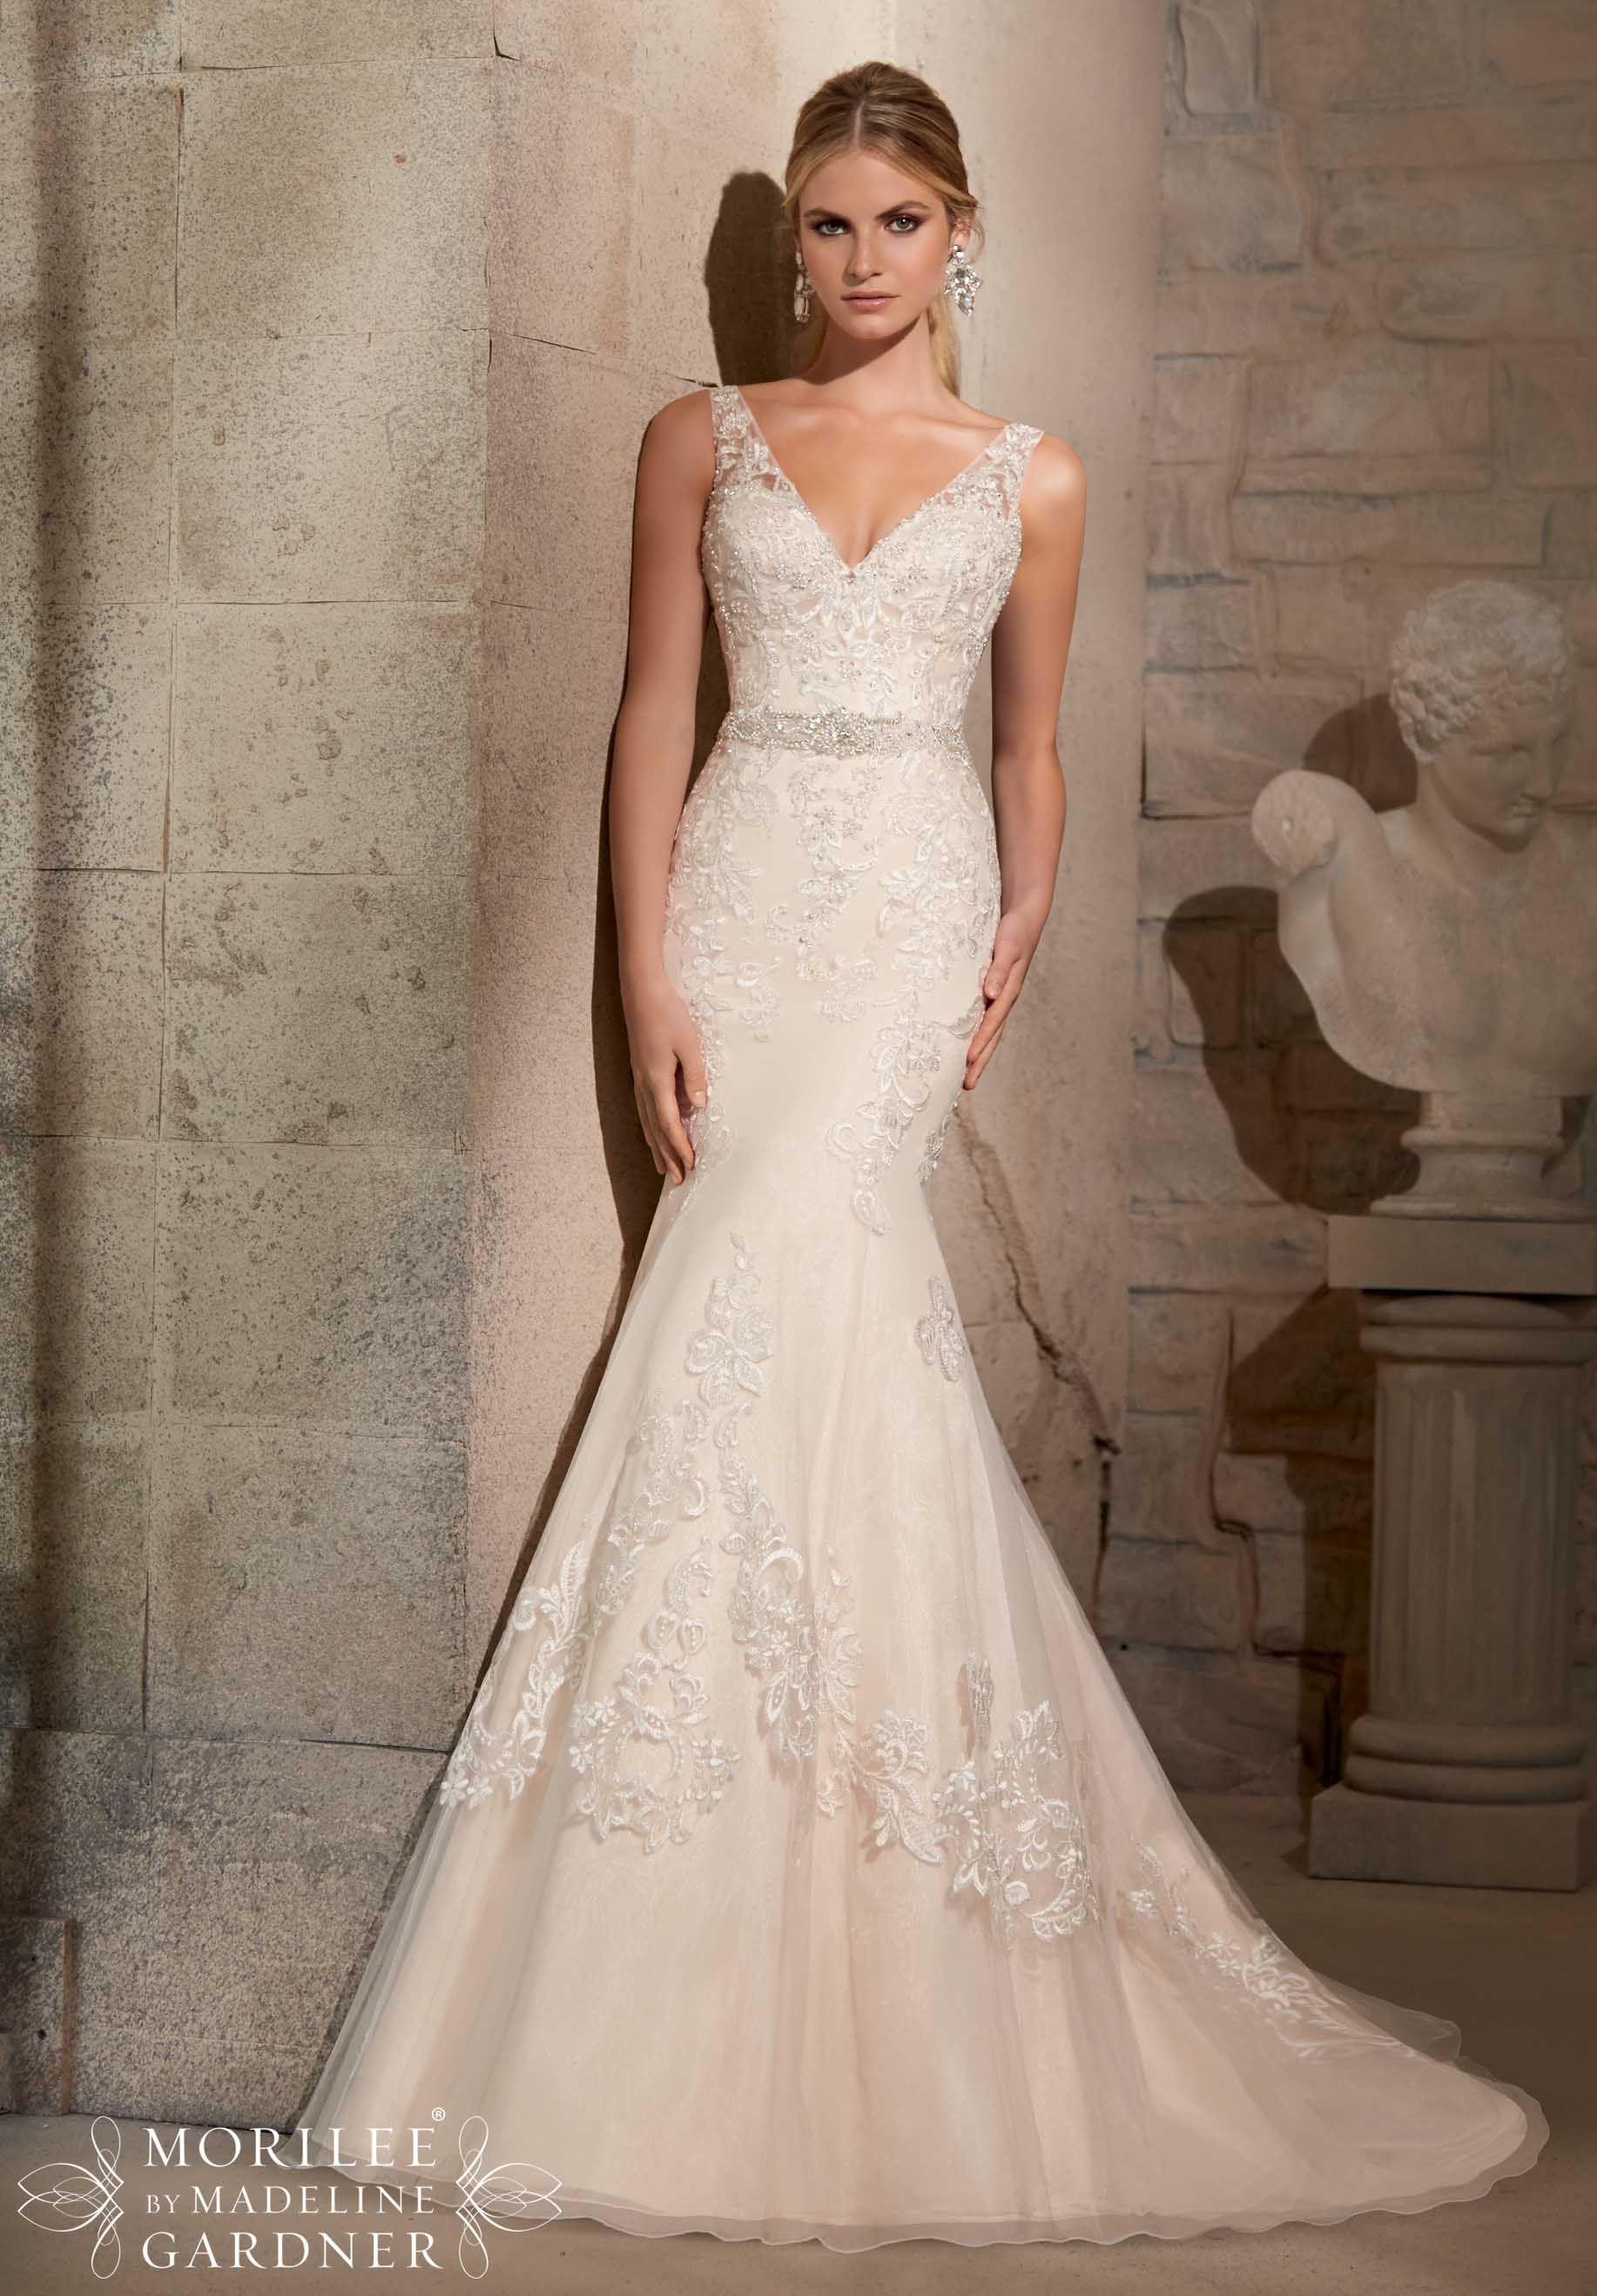 Wedding bridal gowns designer morilee u wedding dress style